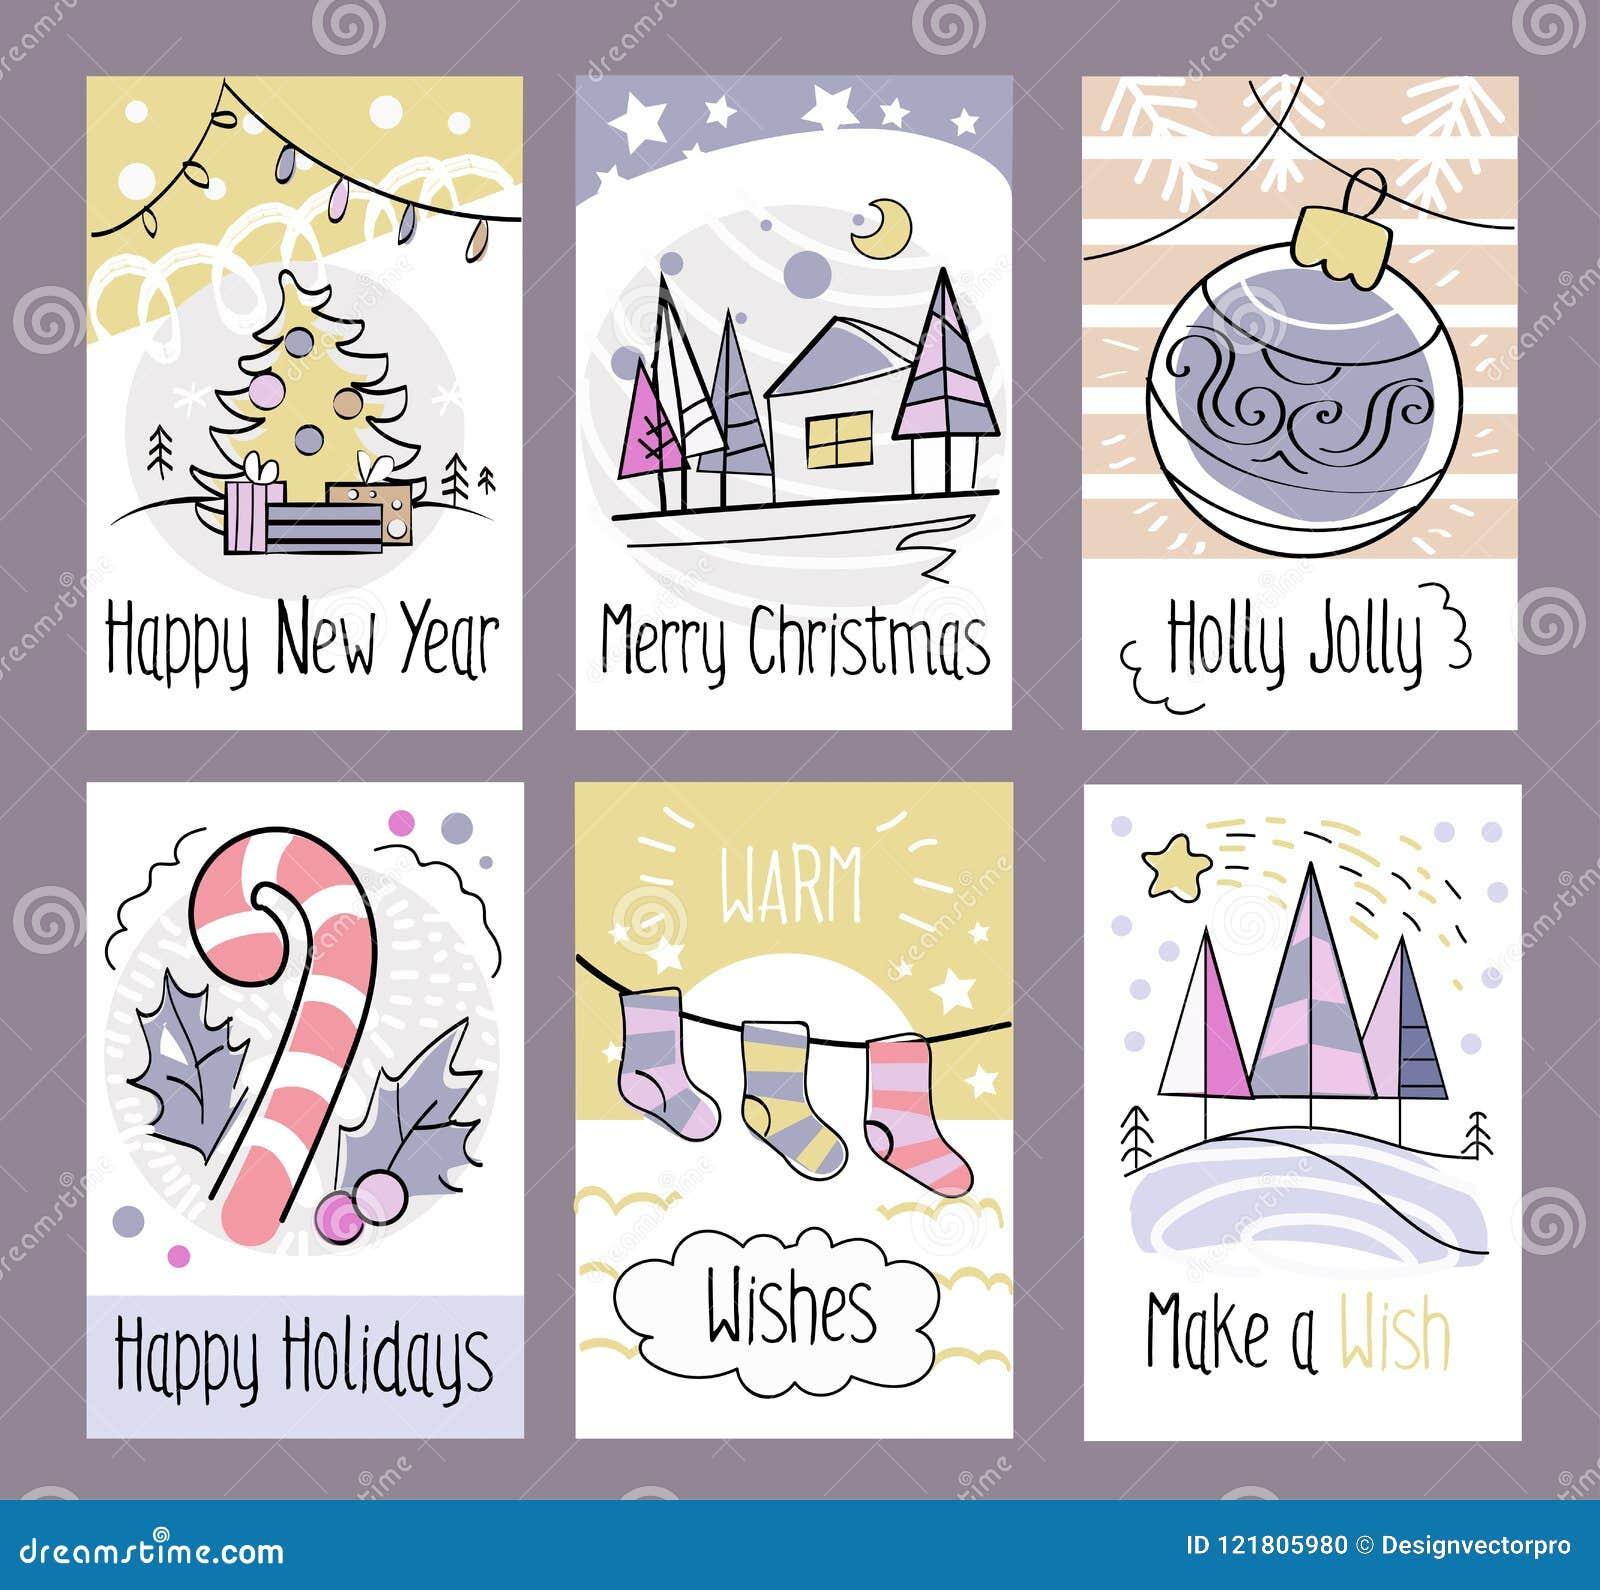 Set of hand drawn christmas greeting cards happy new year merr set of hand drawn christmas greeting cards happy new year merr m4hsunfo